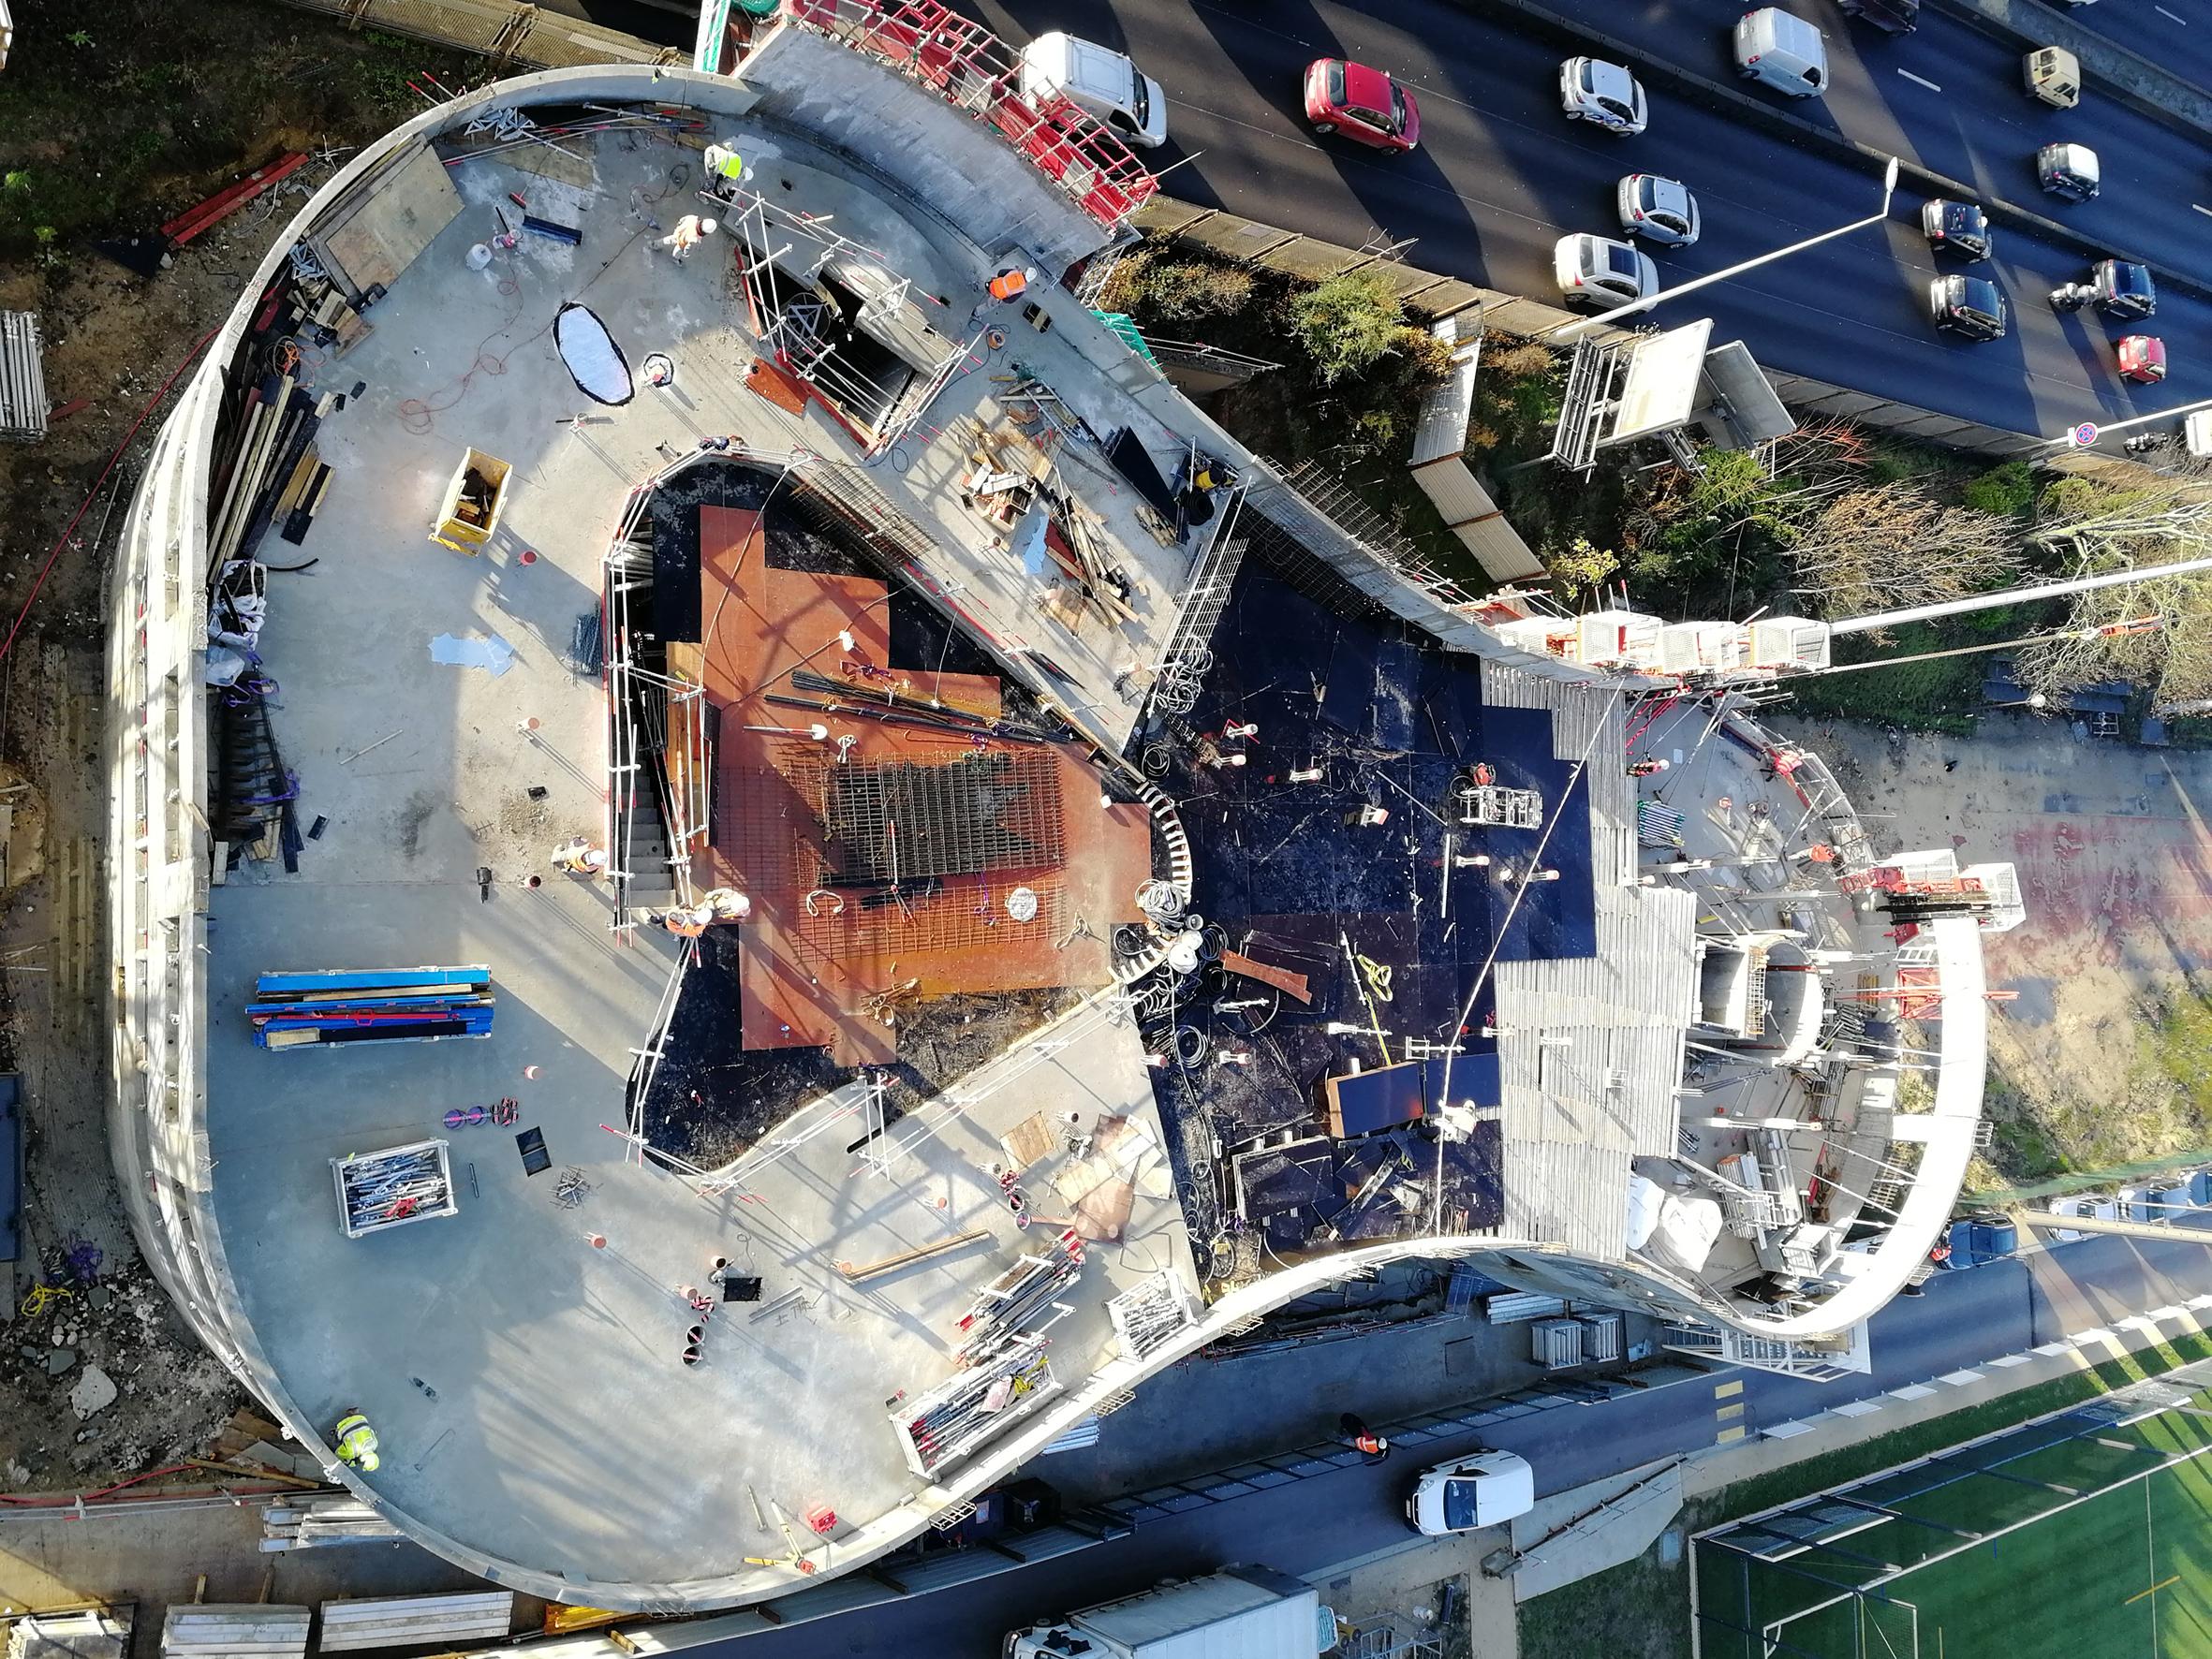 Le chantier du pavillon Pavillon Habib Bourguiba (Maison de la Tunisie)